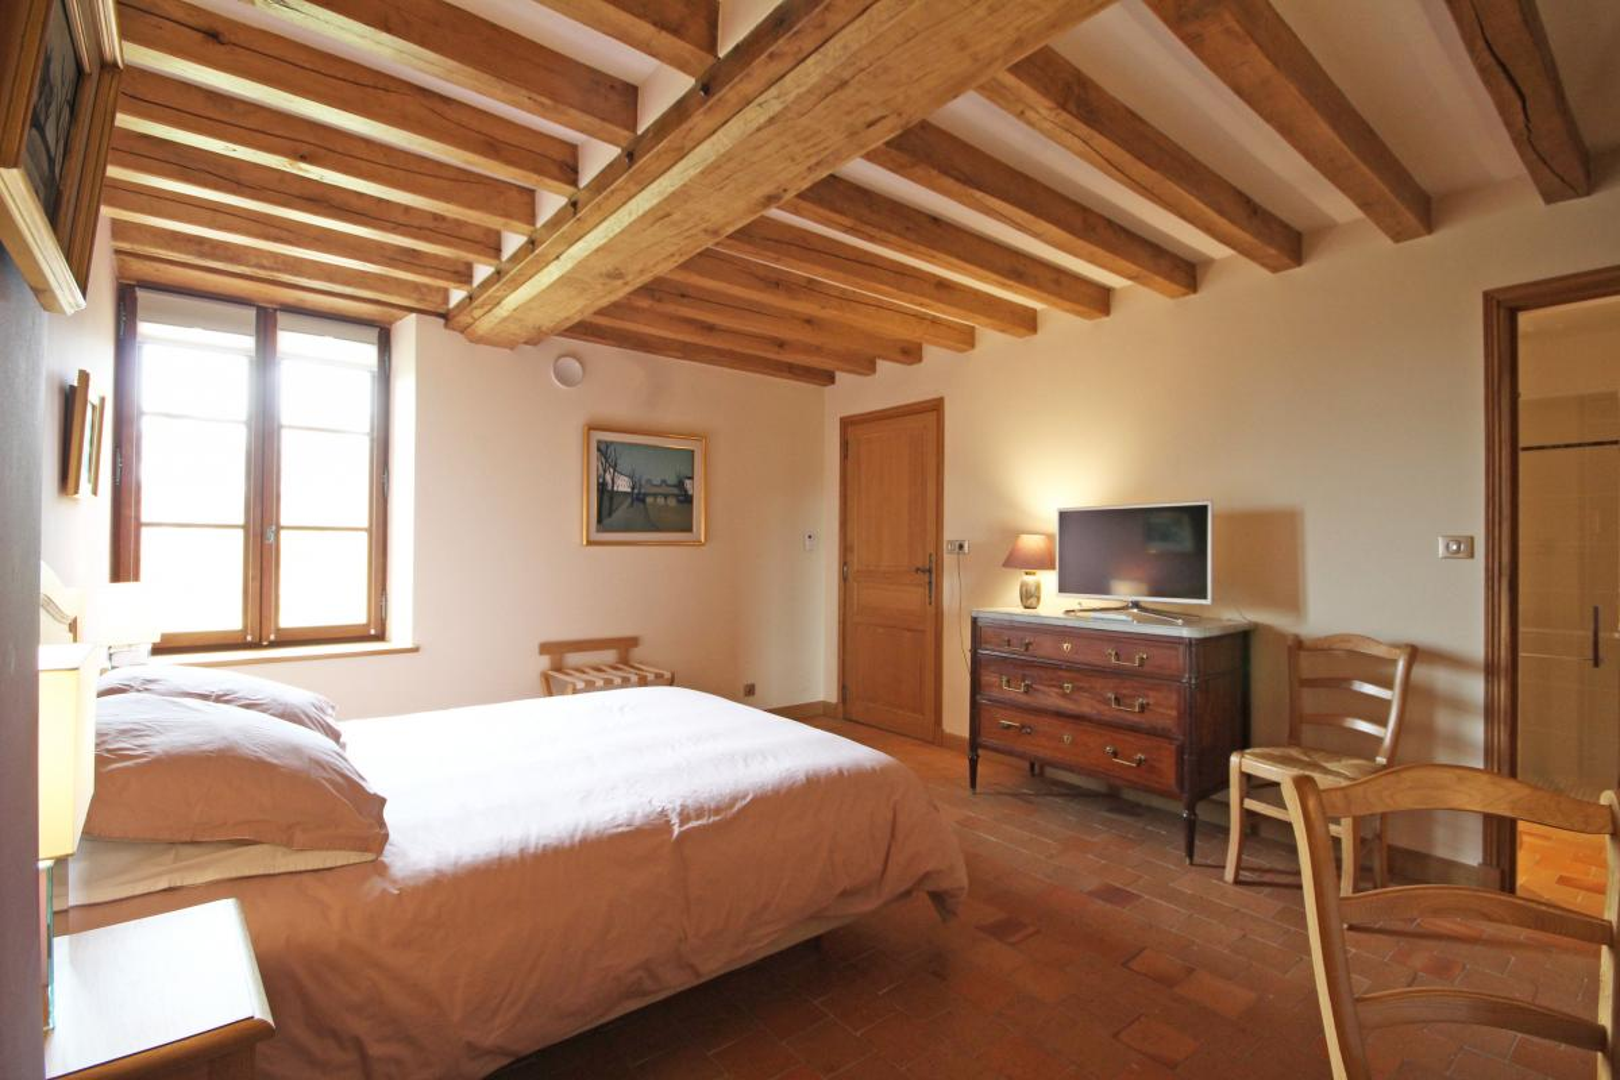 Chambre Dhtes G1271 La Barbinire Les Ferrettes